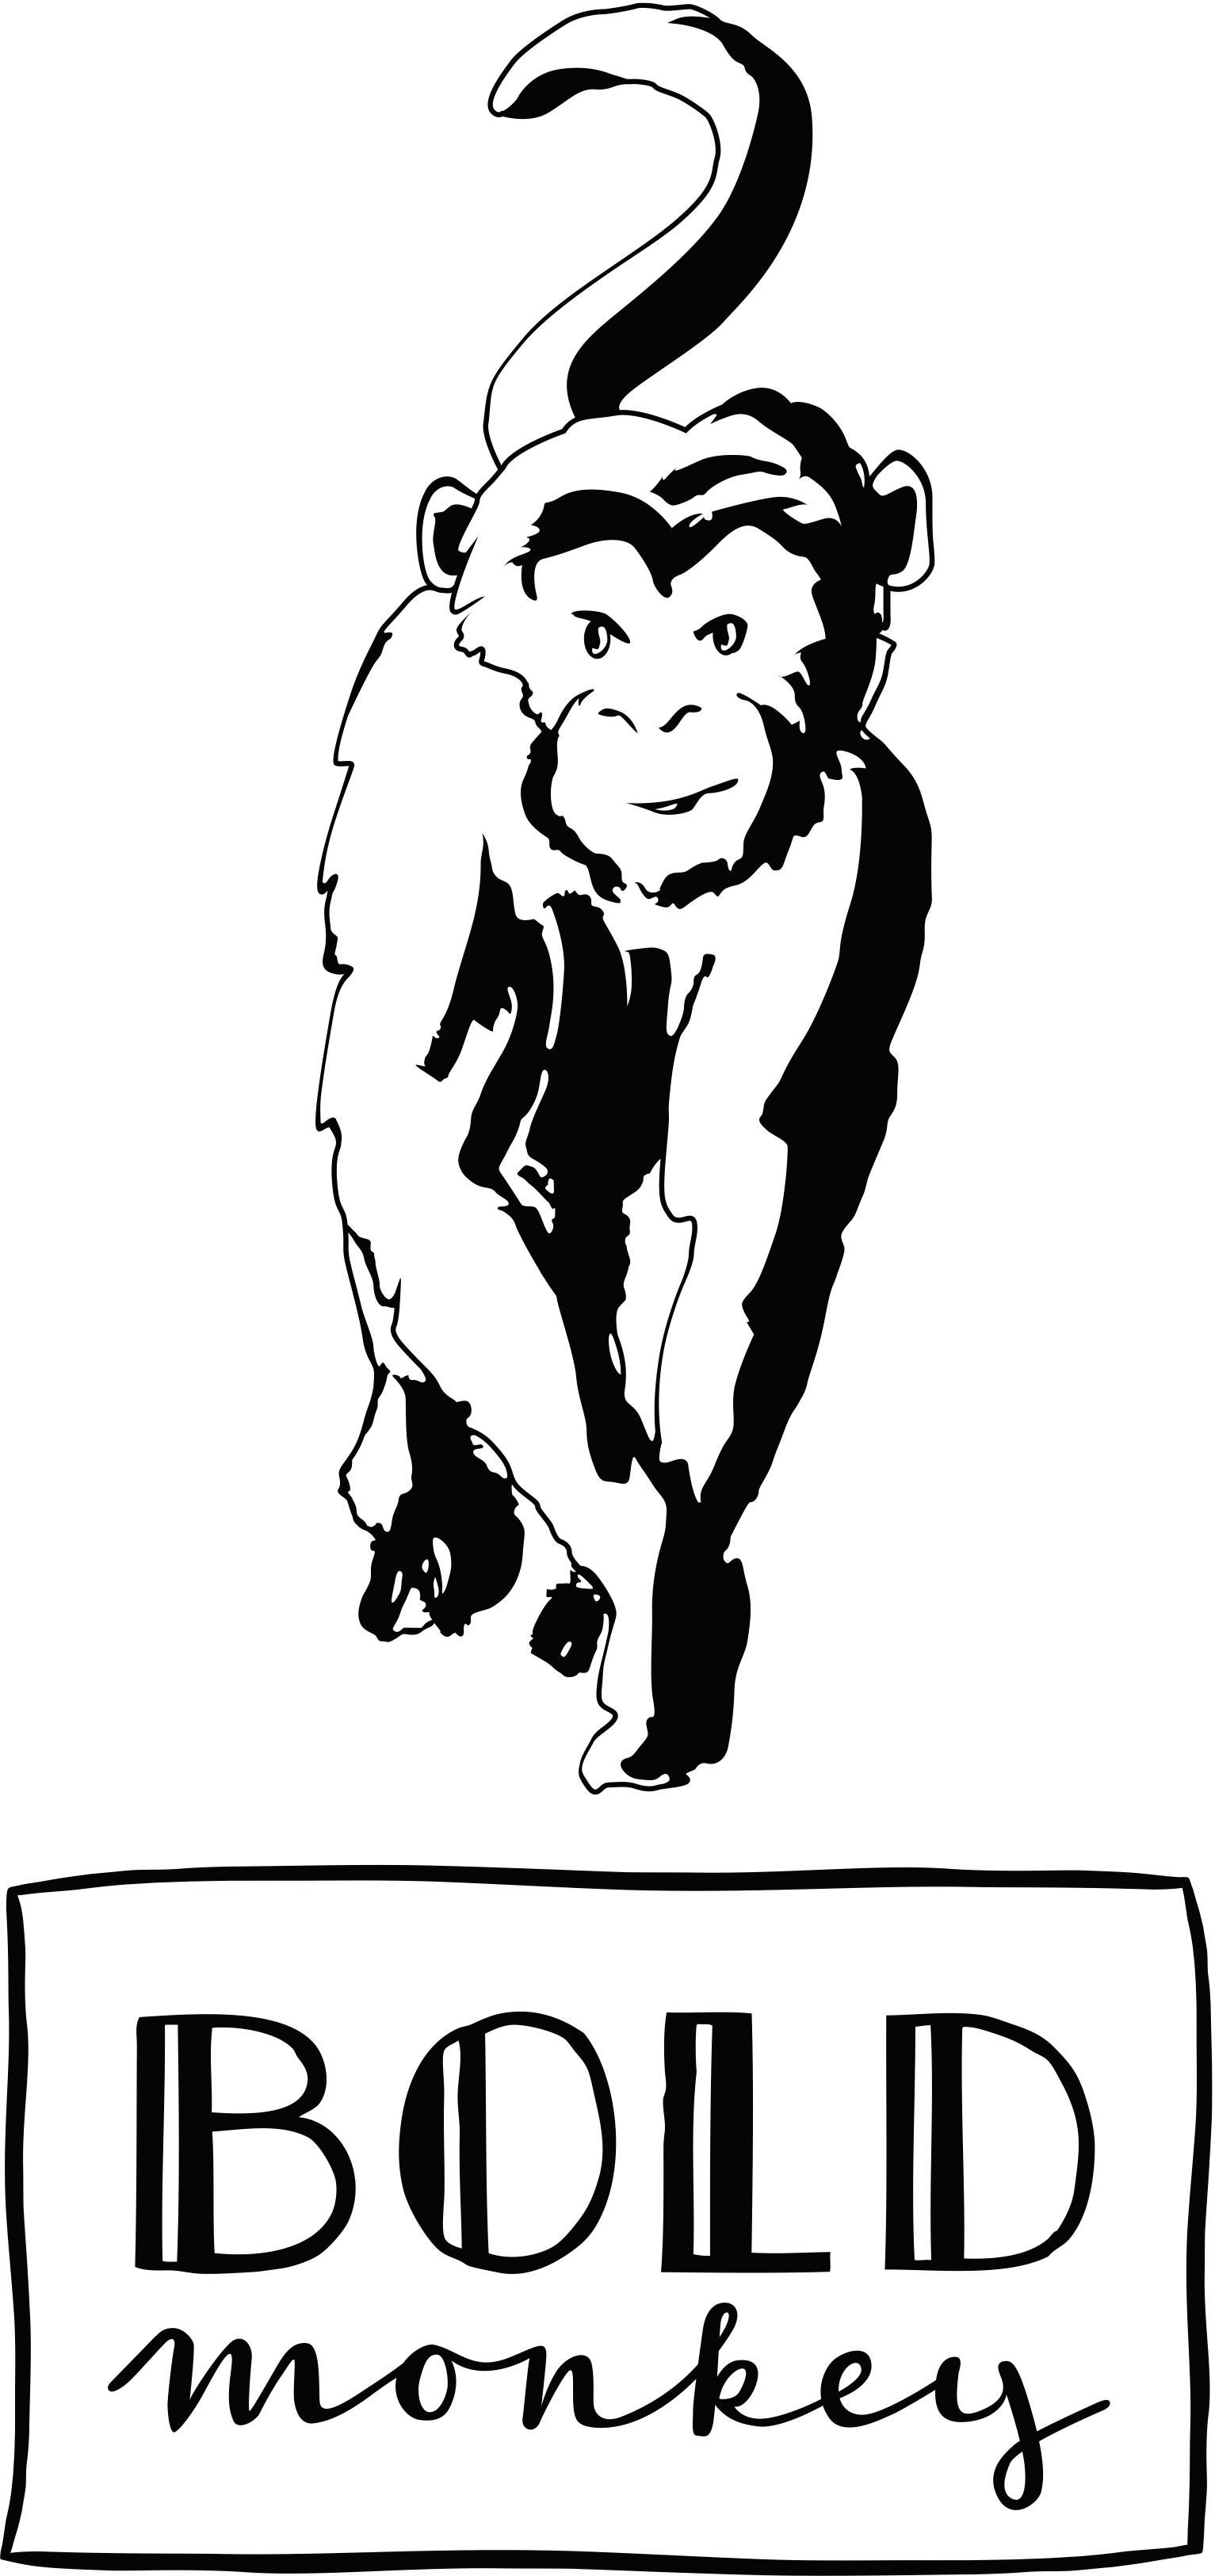 Genial Bold Monkey